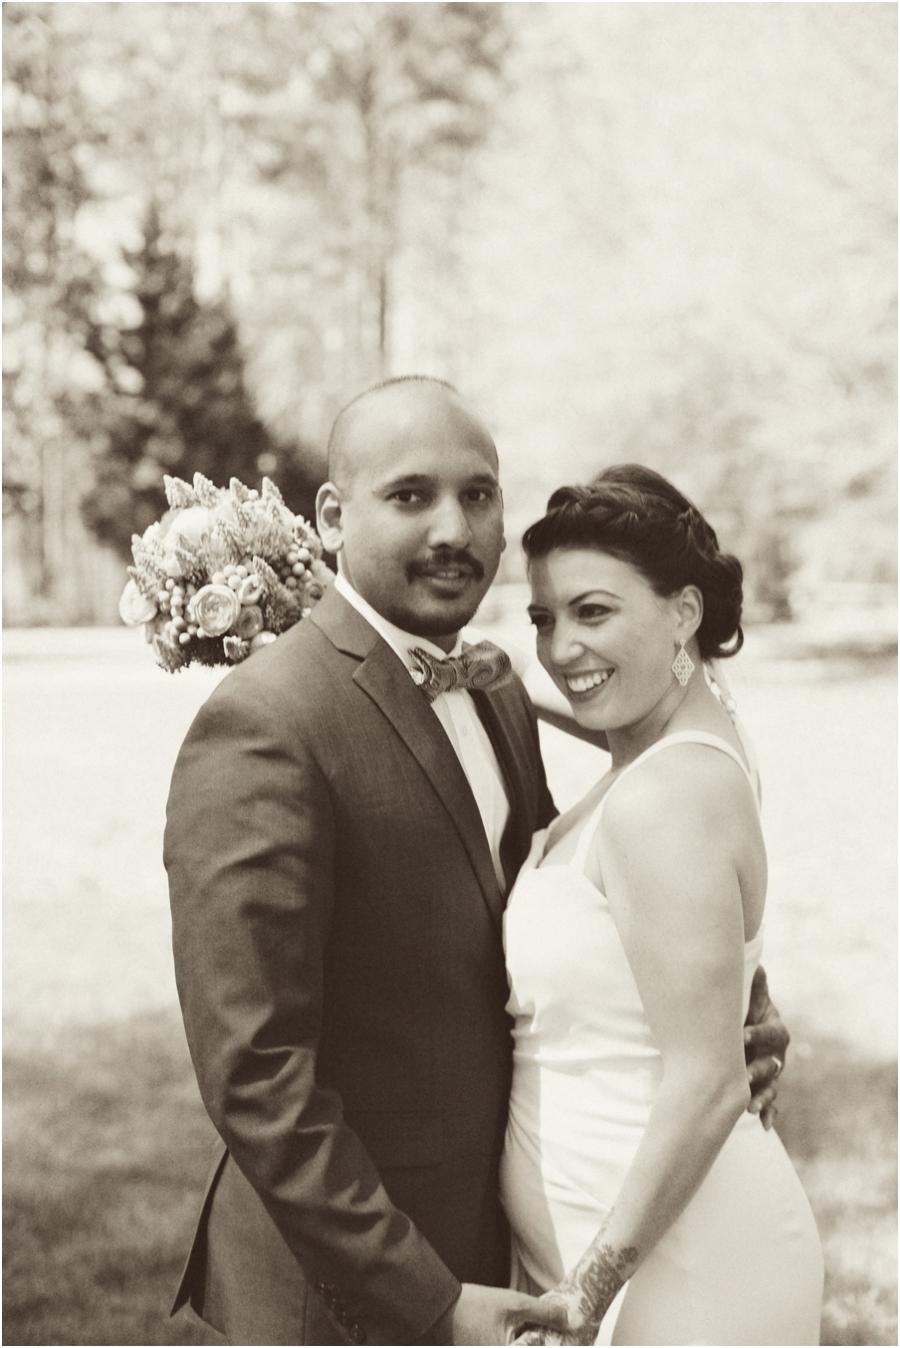 vintage wedding portrait photography, vintage wedding photographers